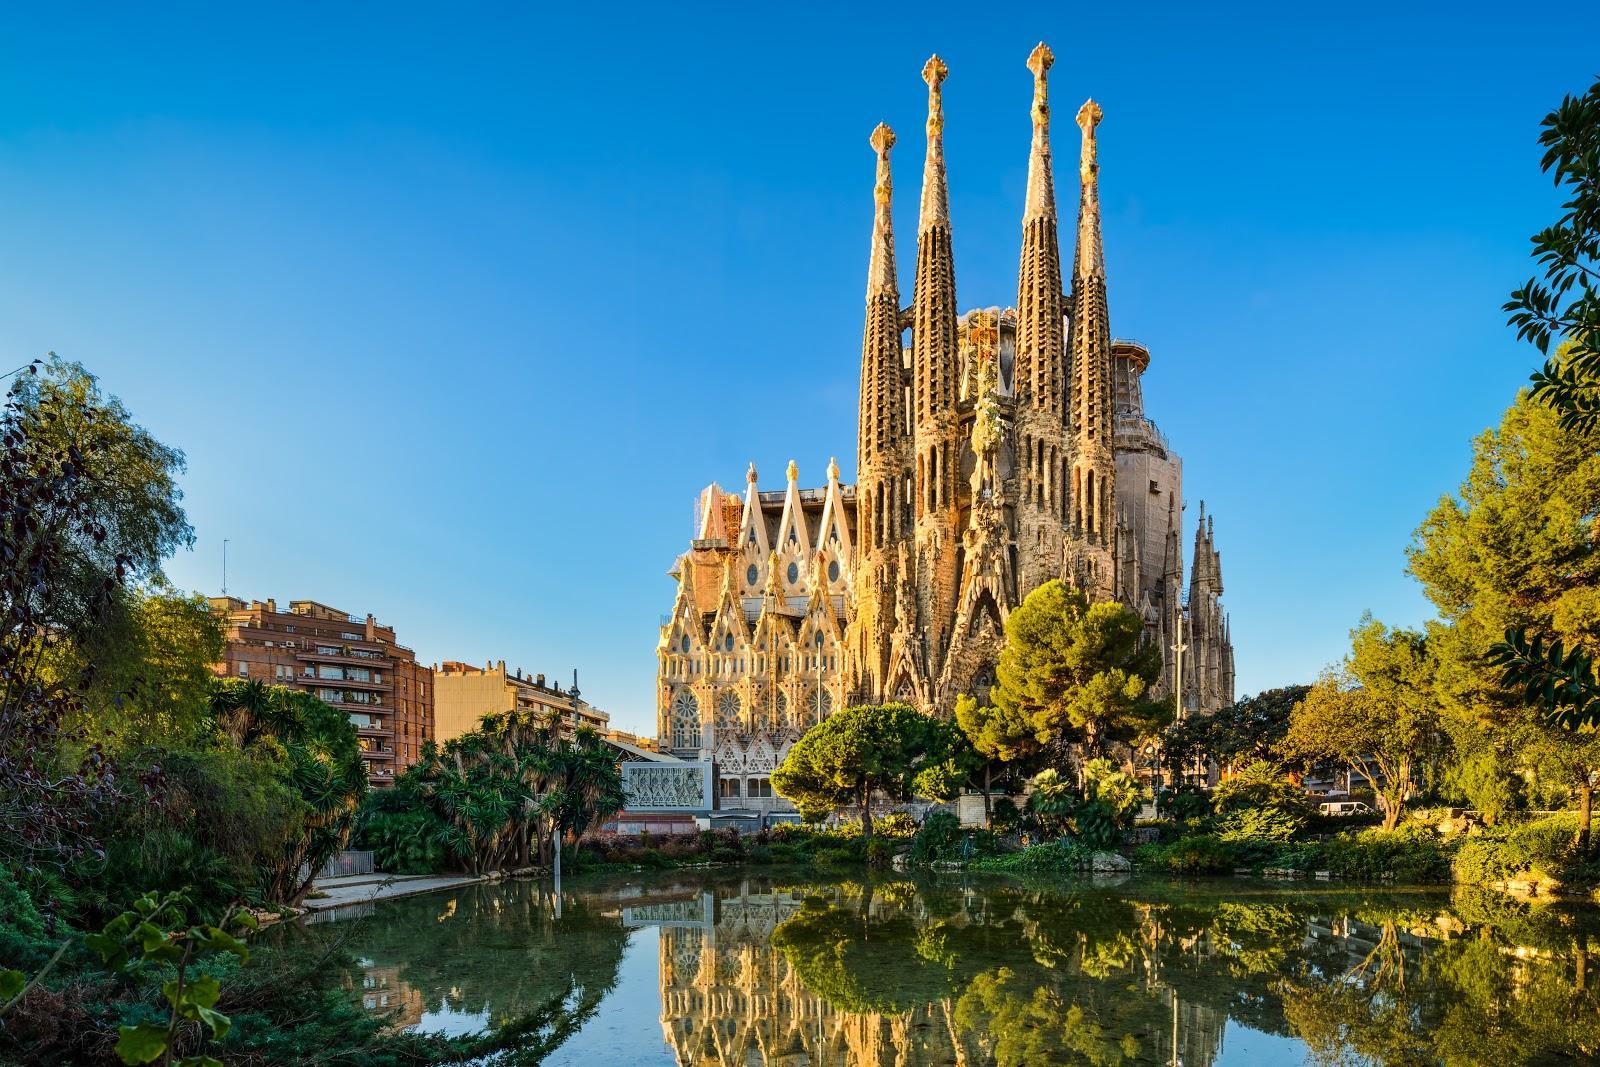 An exterior shot of the Sagrada Famila reflecting off a pond.